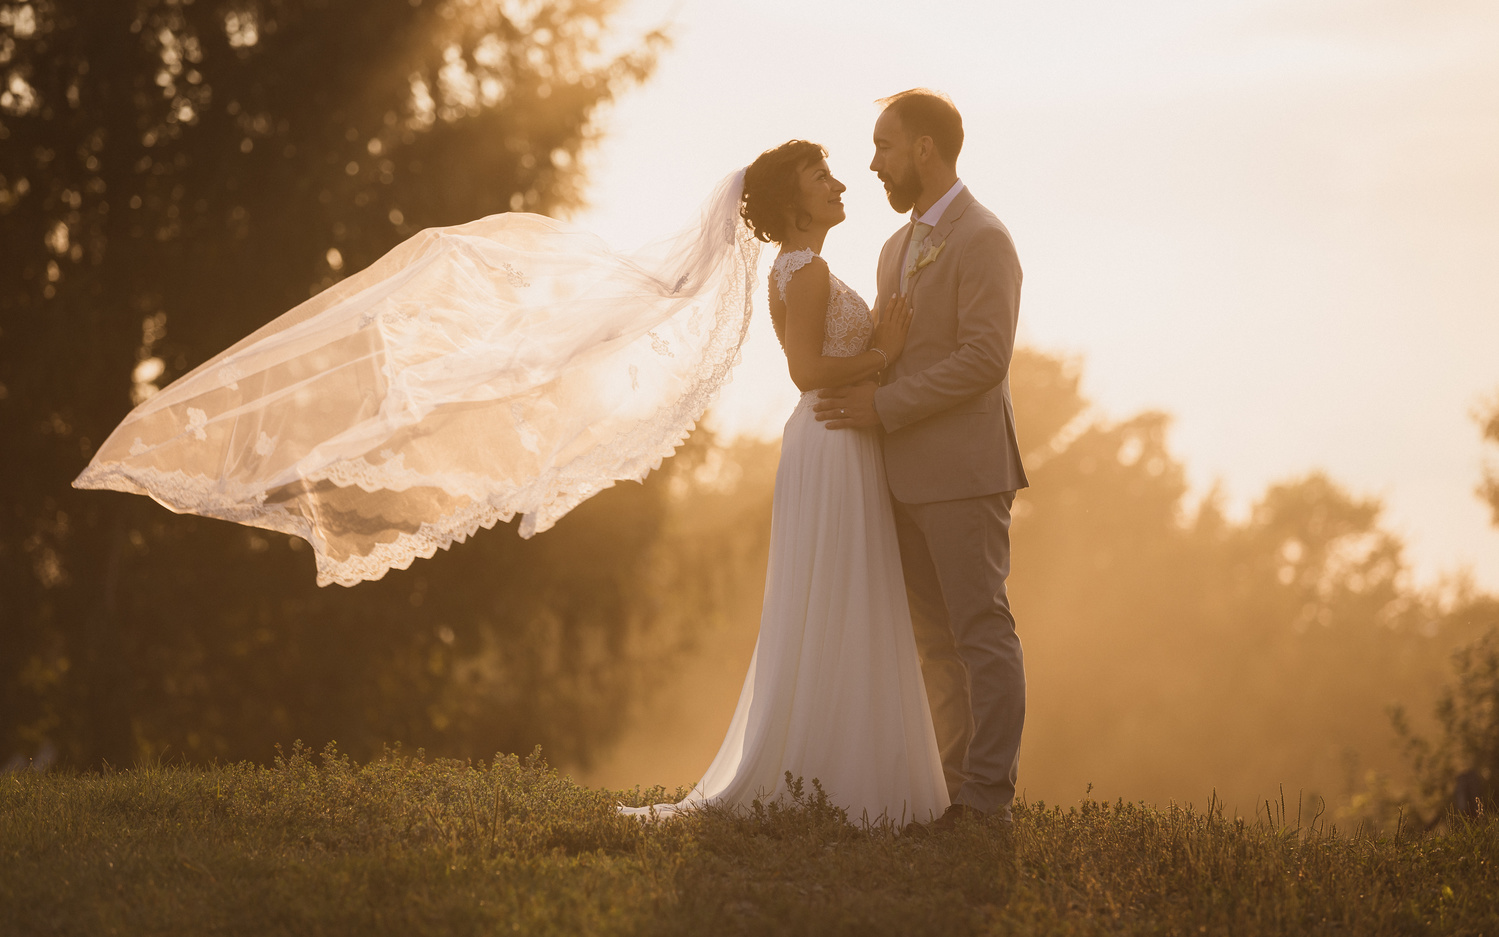 Mandy & Randy Weddings by Randy Smith